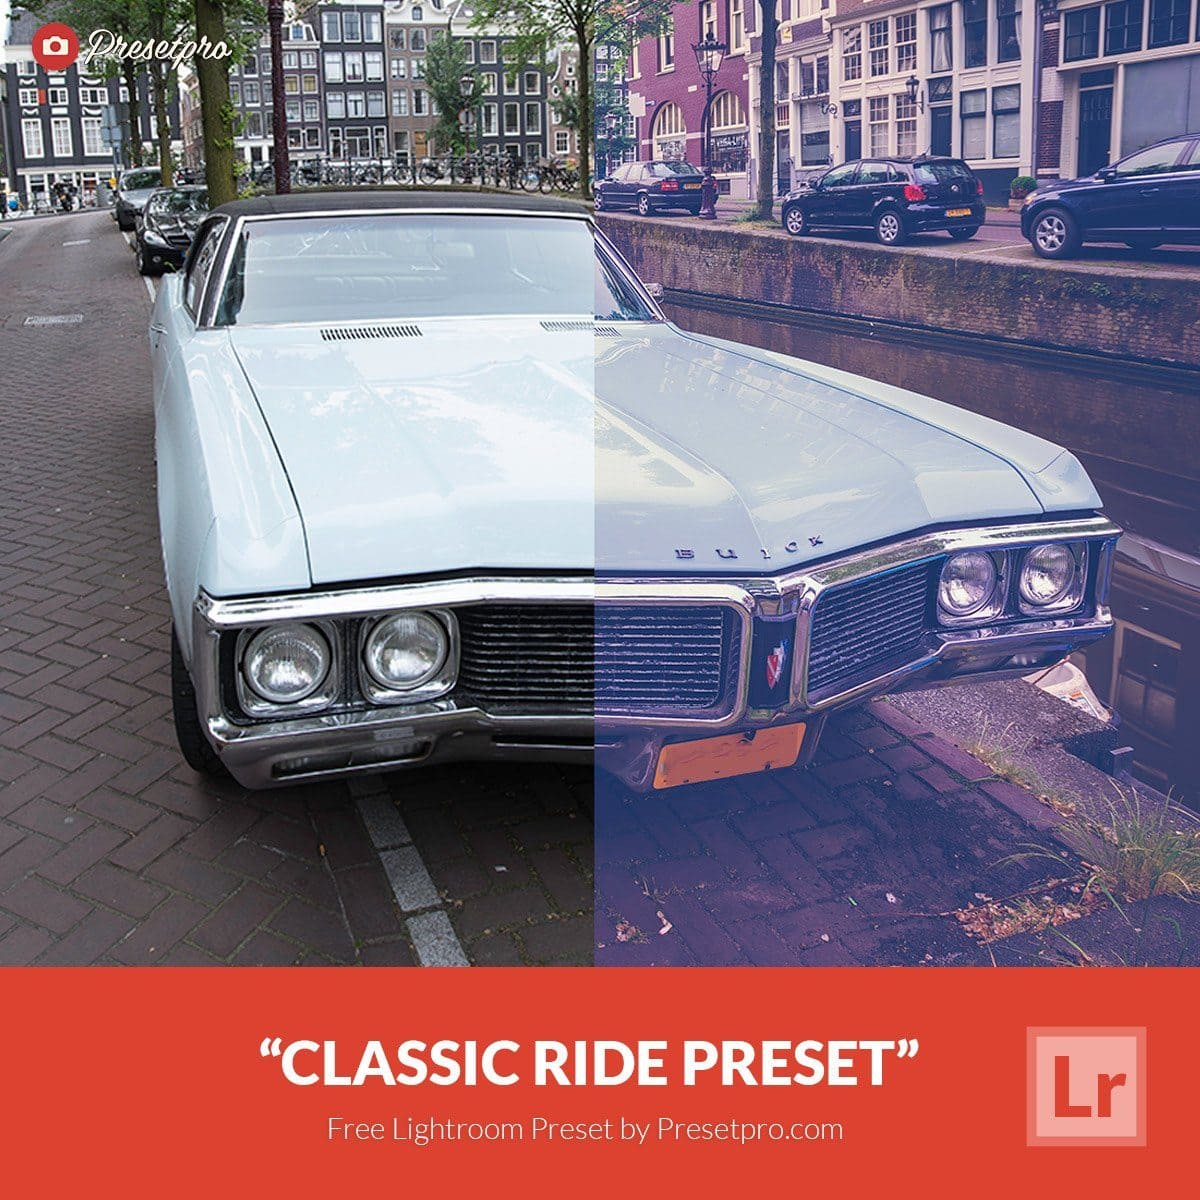 Free-Lightroom-Preset-Classic-Ride